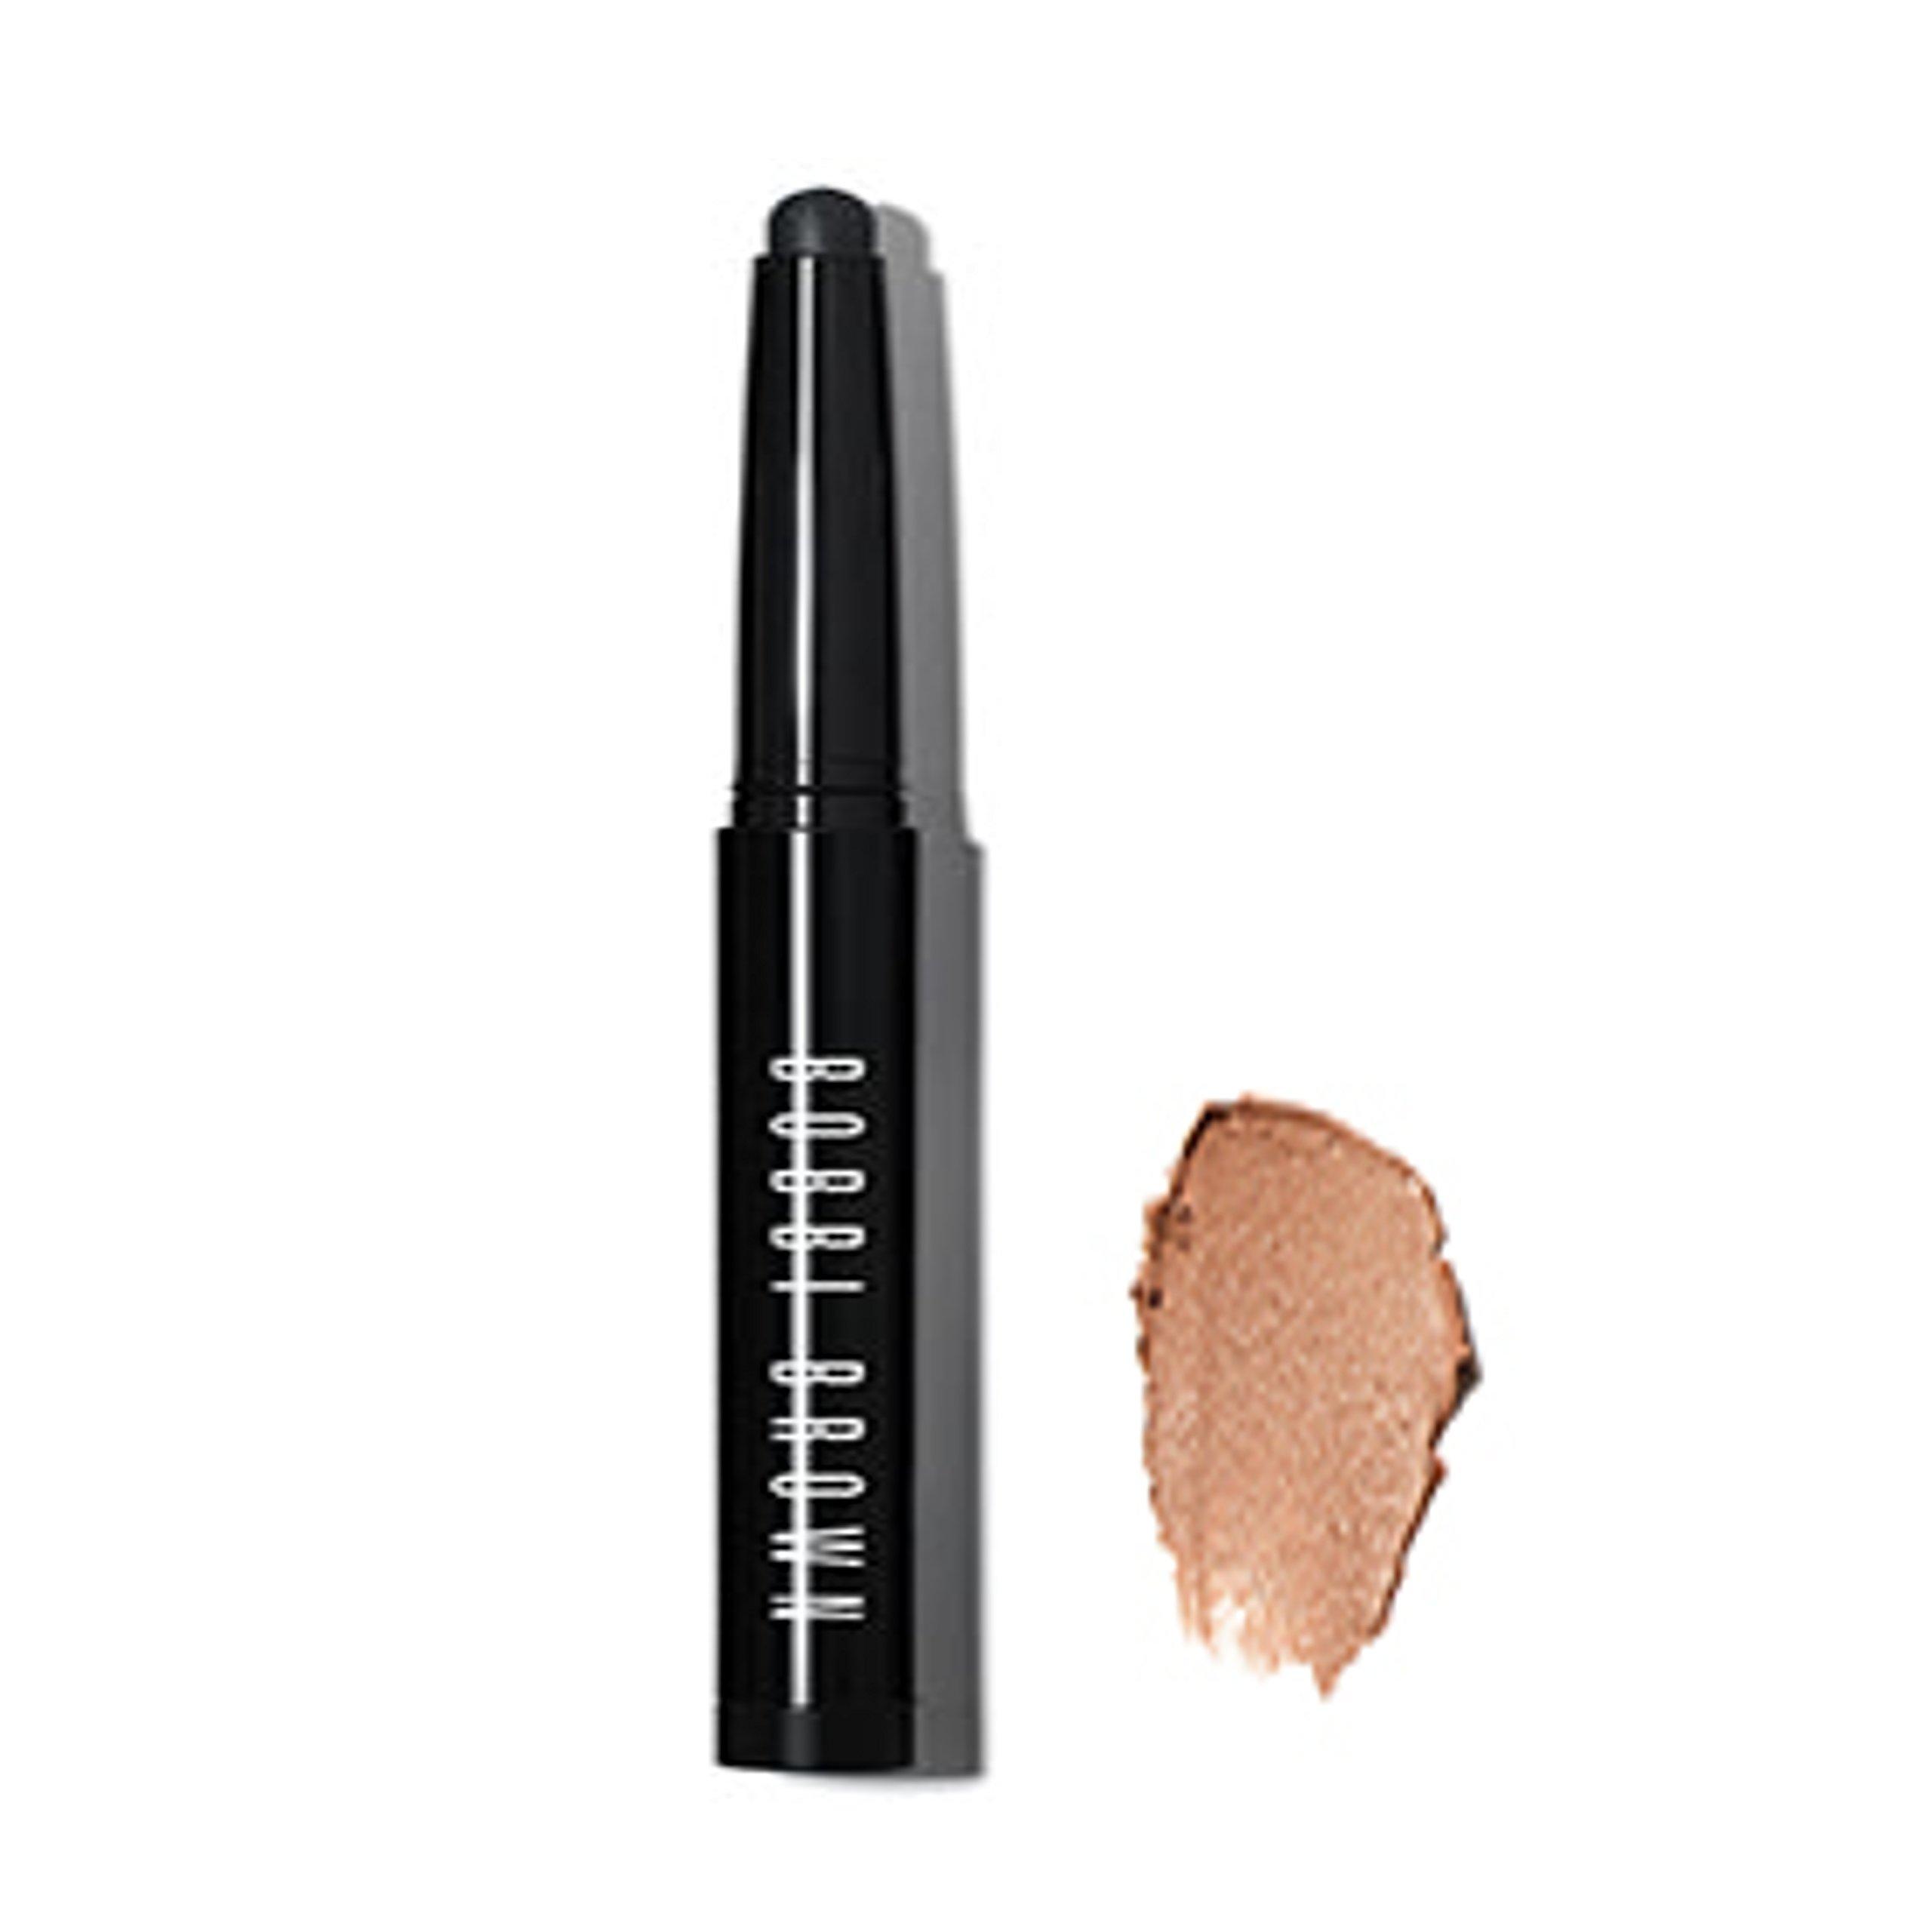 Amazoncom Bobbi Brown Long Wear Cream Shadow Stick Taupe Beauty